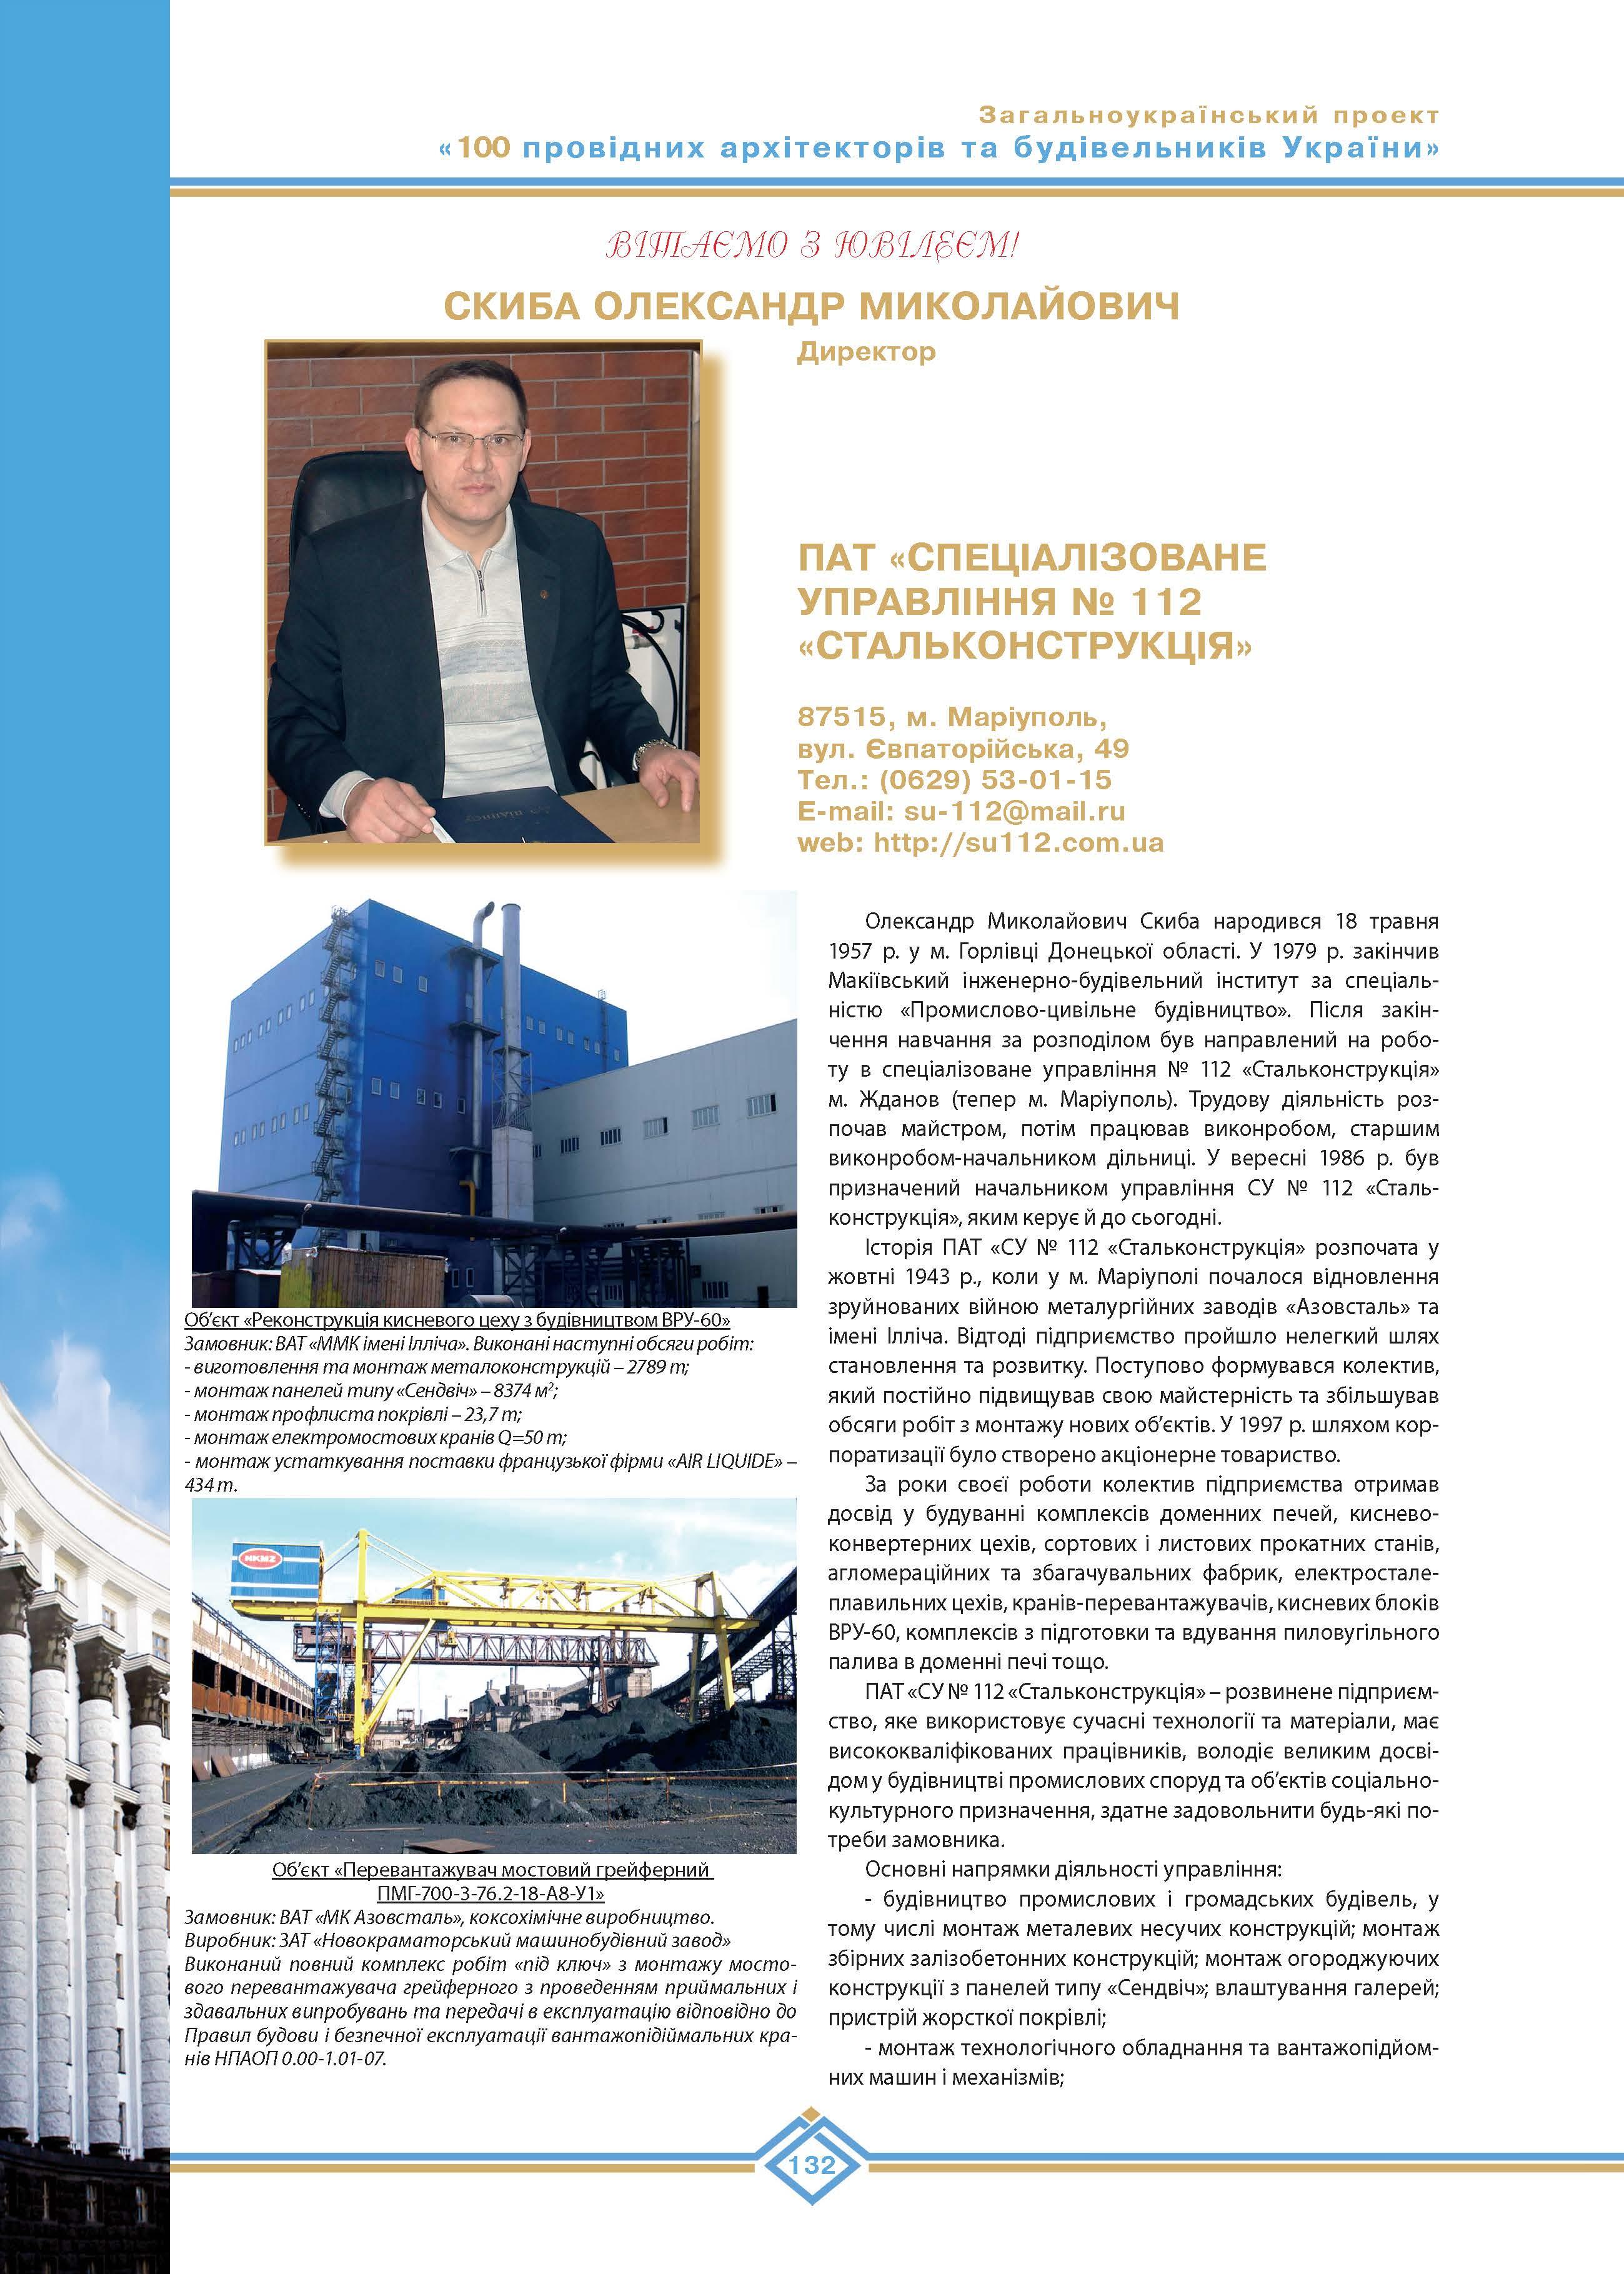 Скиба Олександр Миколайович